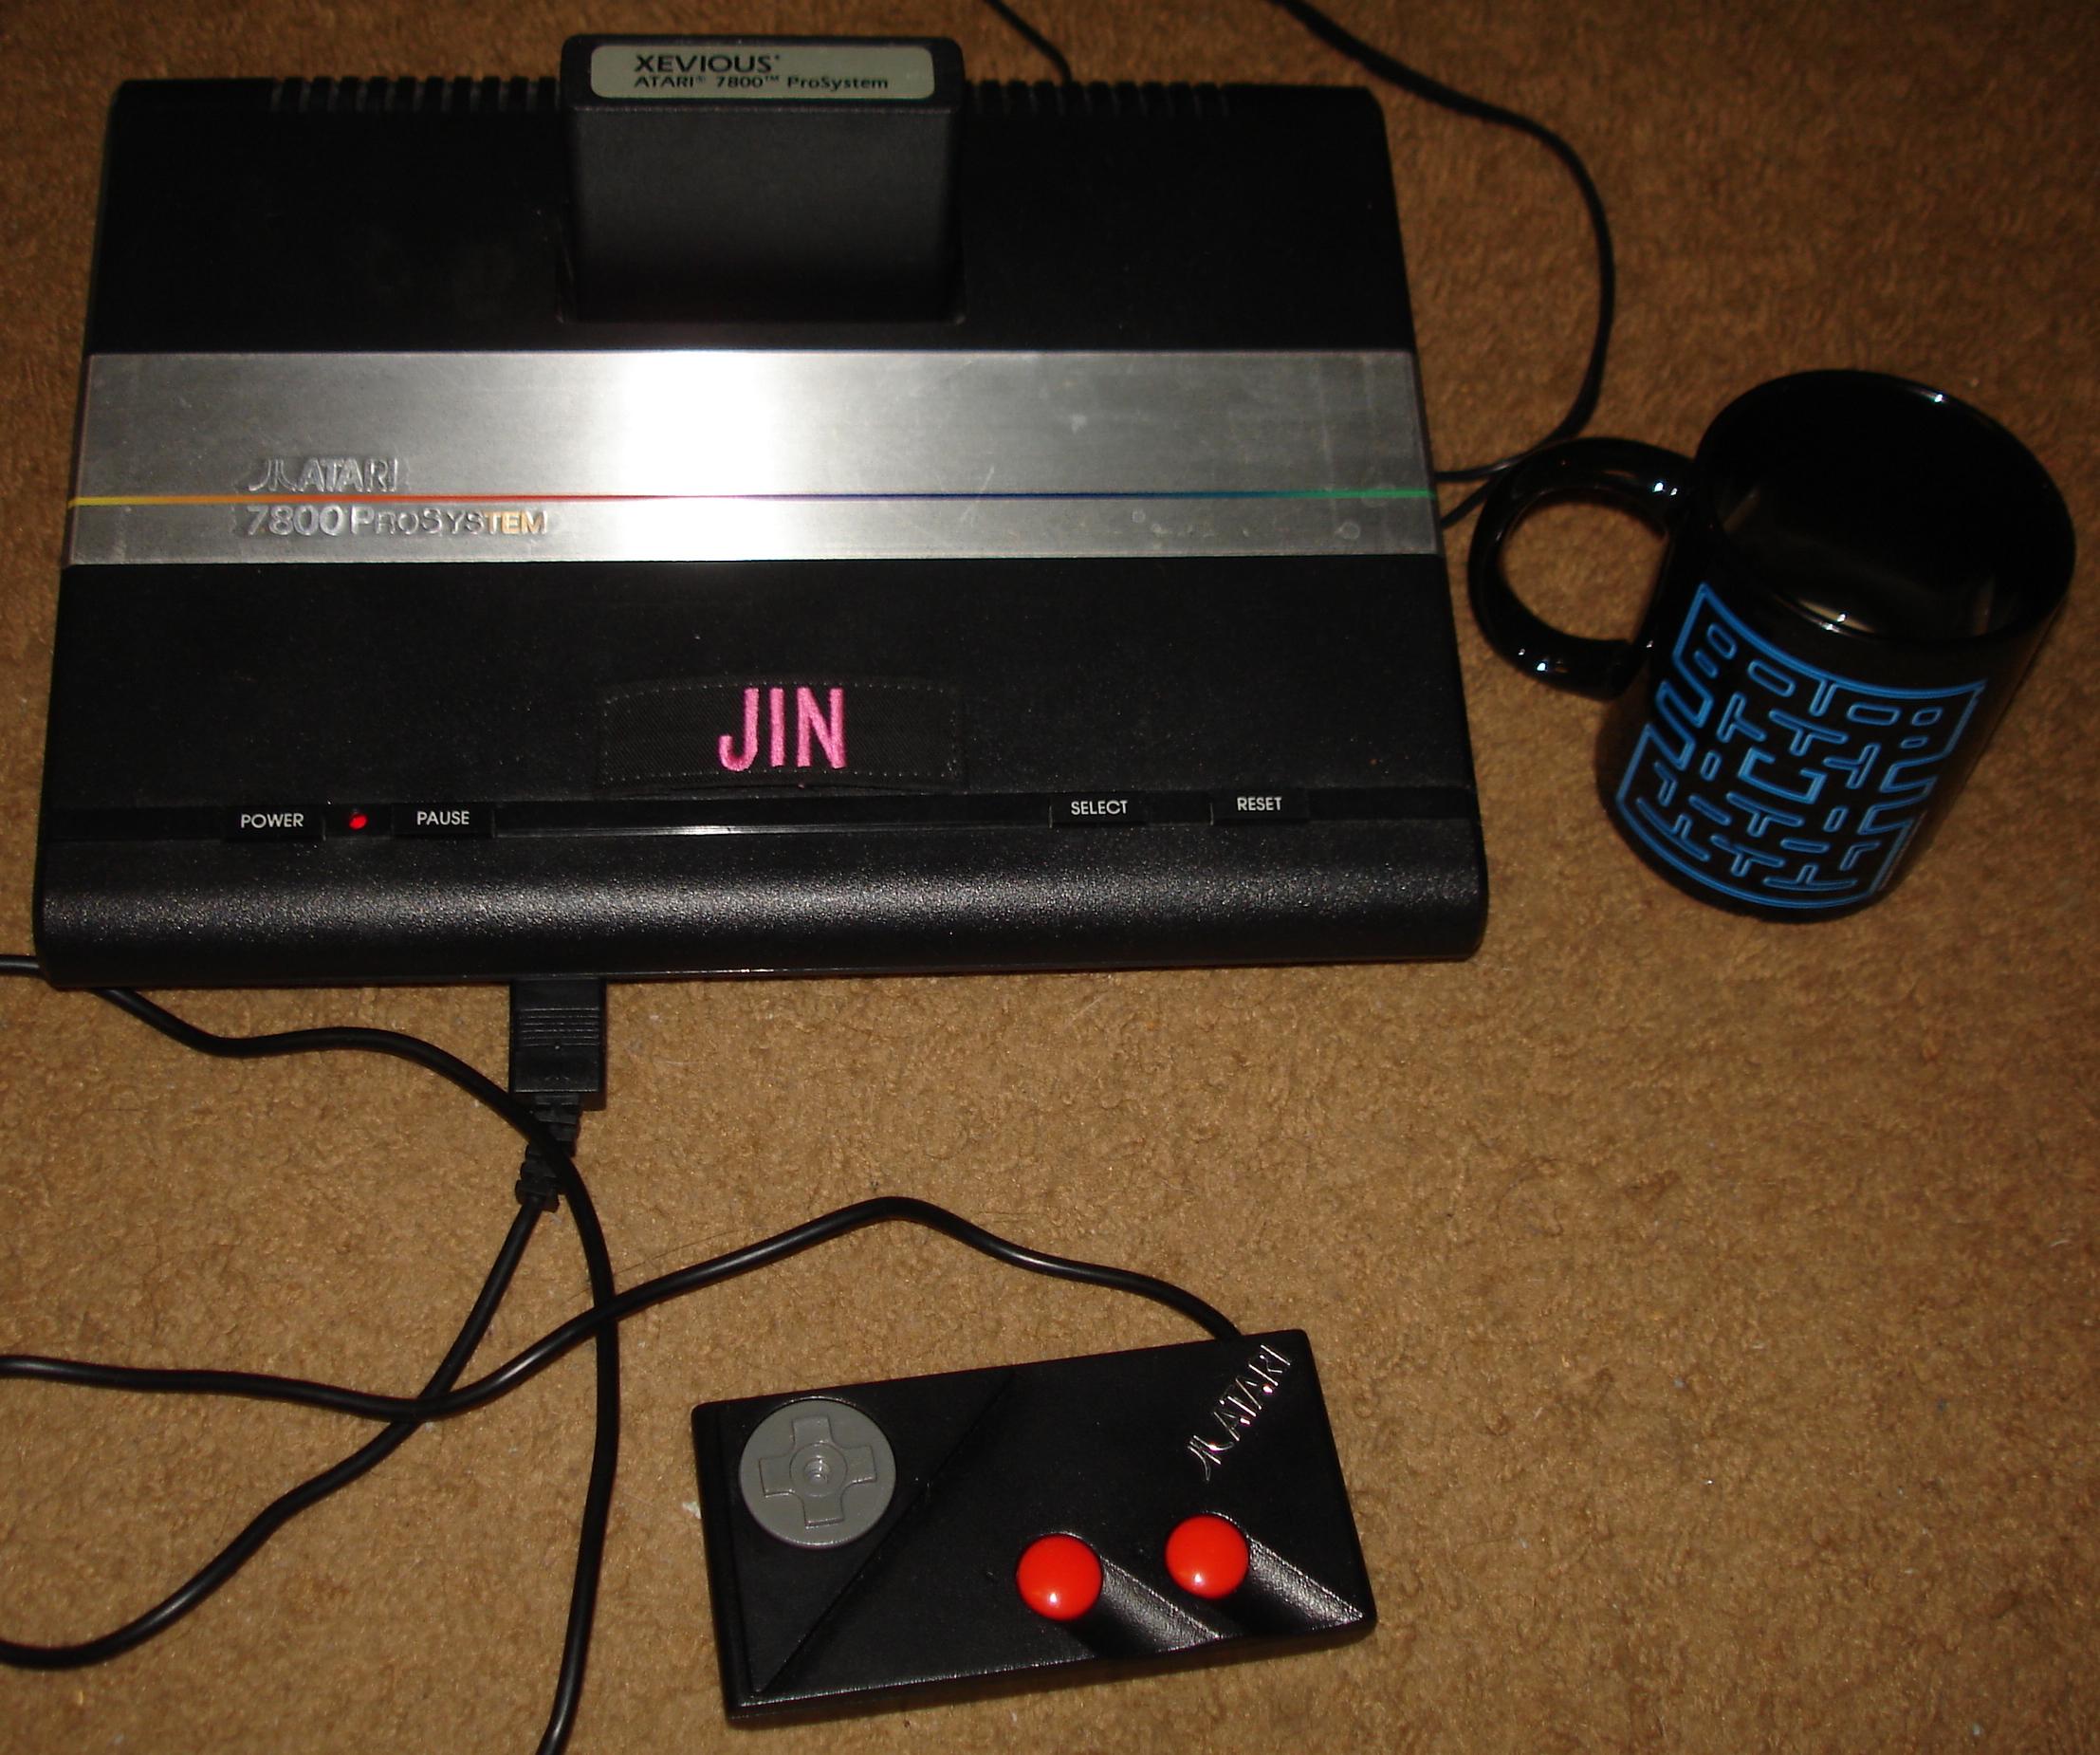 Jin: Xevious: Intermediate (Atari 7800) 291,150 points on 2017-12-09 18:14:11